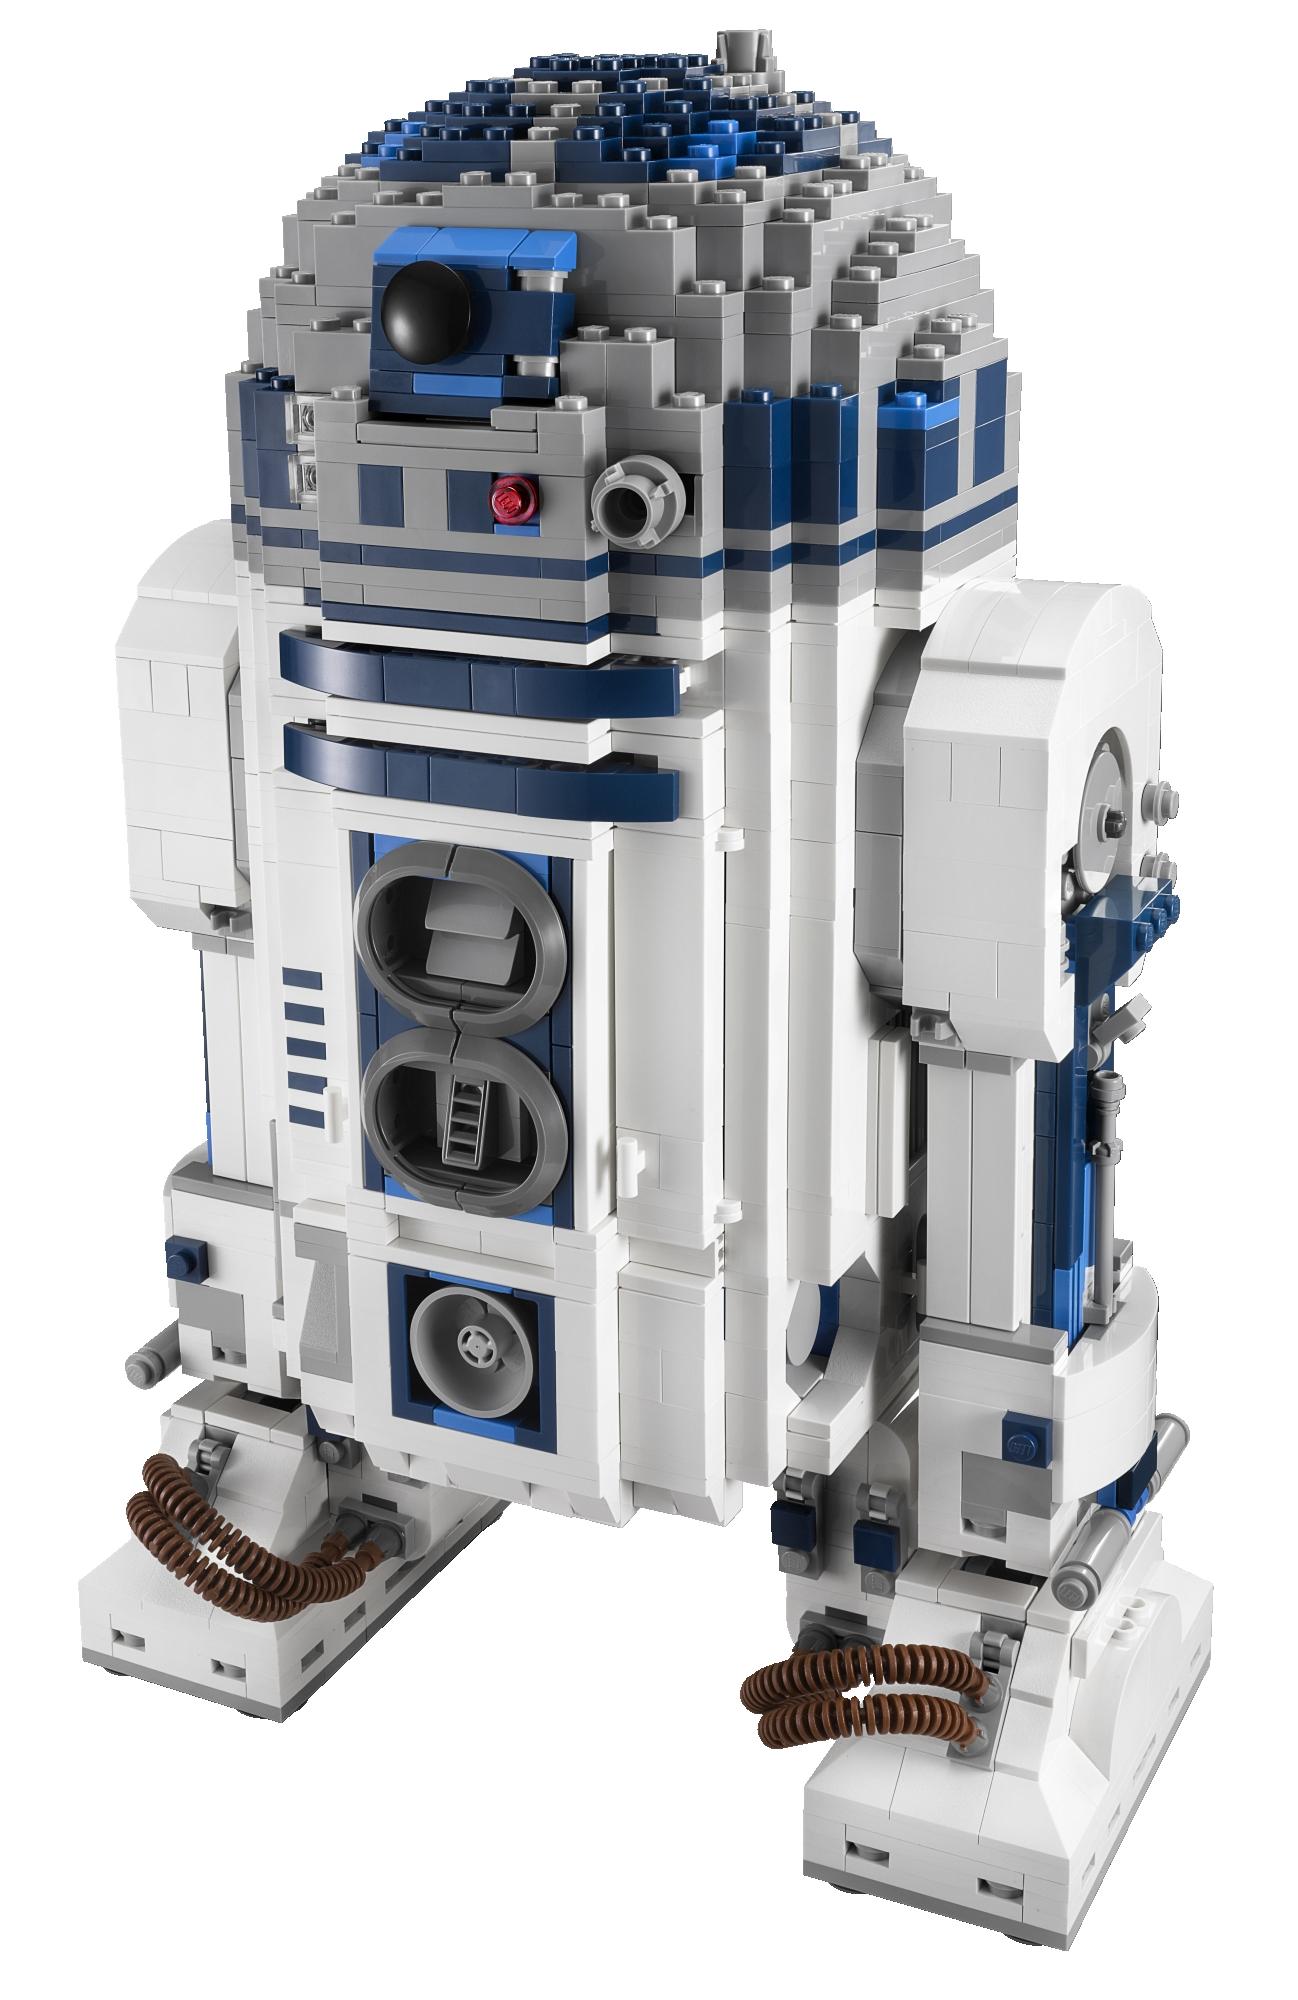 Tales to astonish announcement lego ucs r2 d2 - Lego starwars r2d2 ...